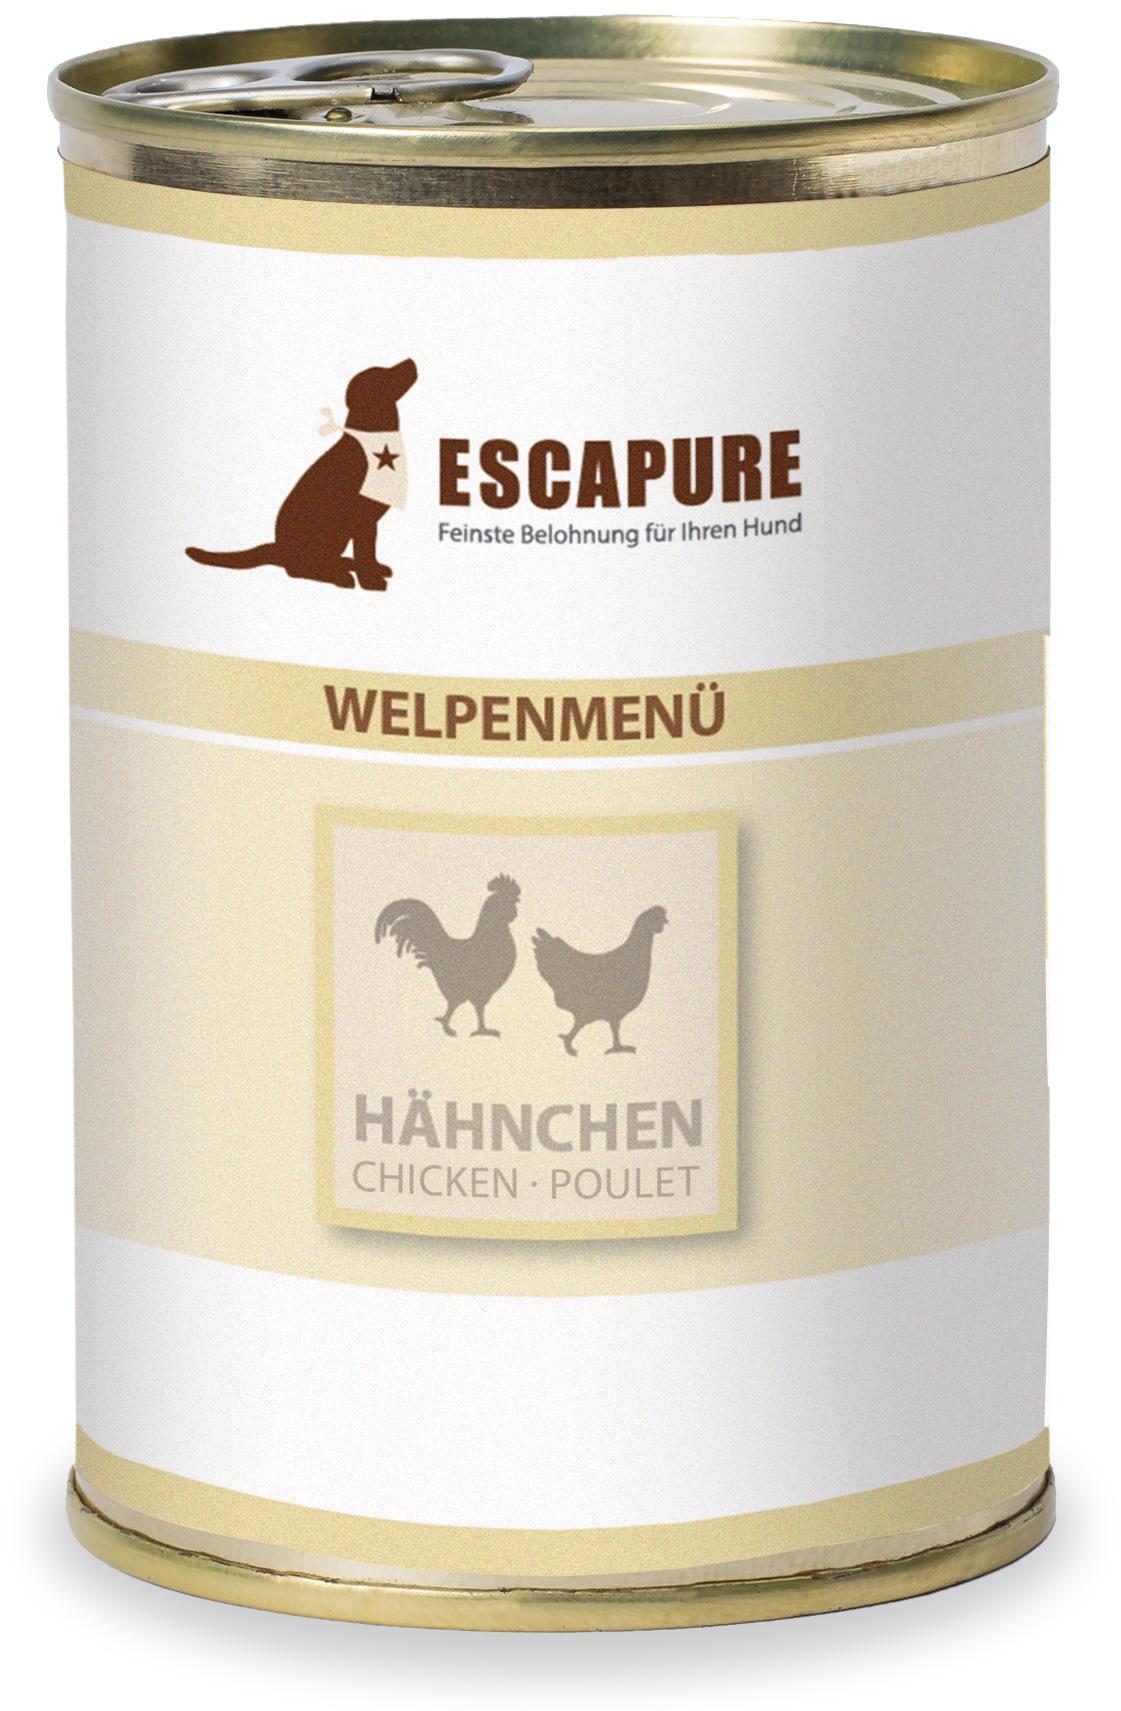 Escapure Welpenmenü 400g